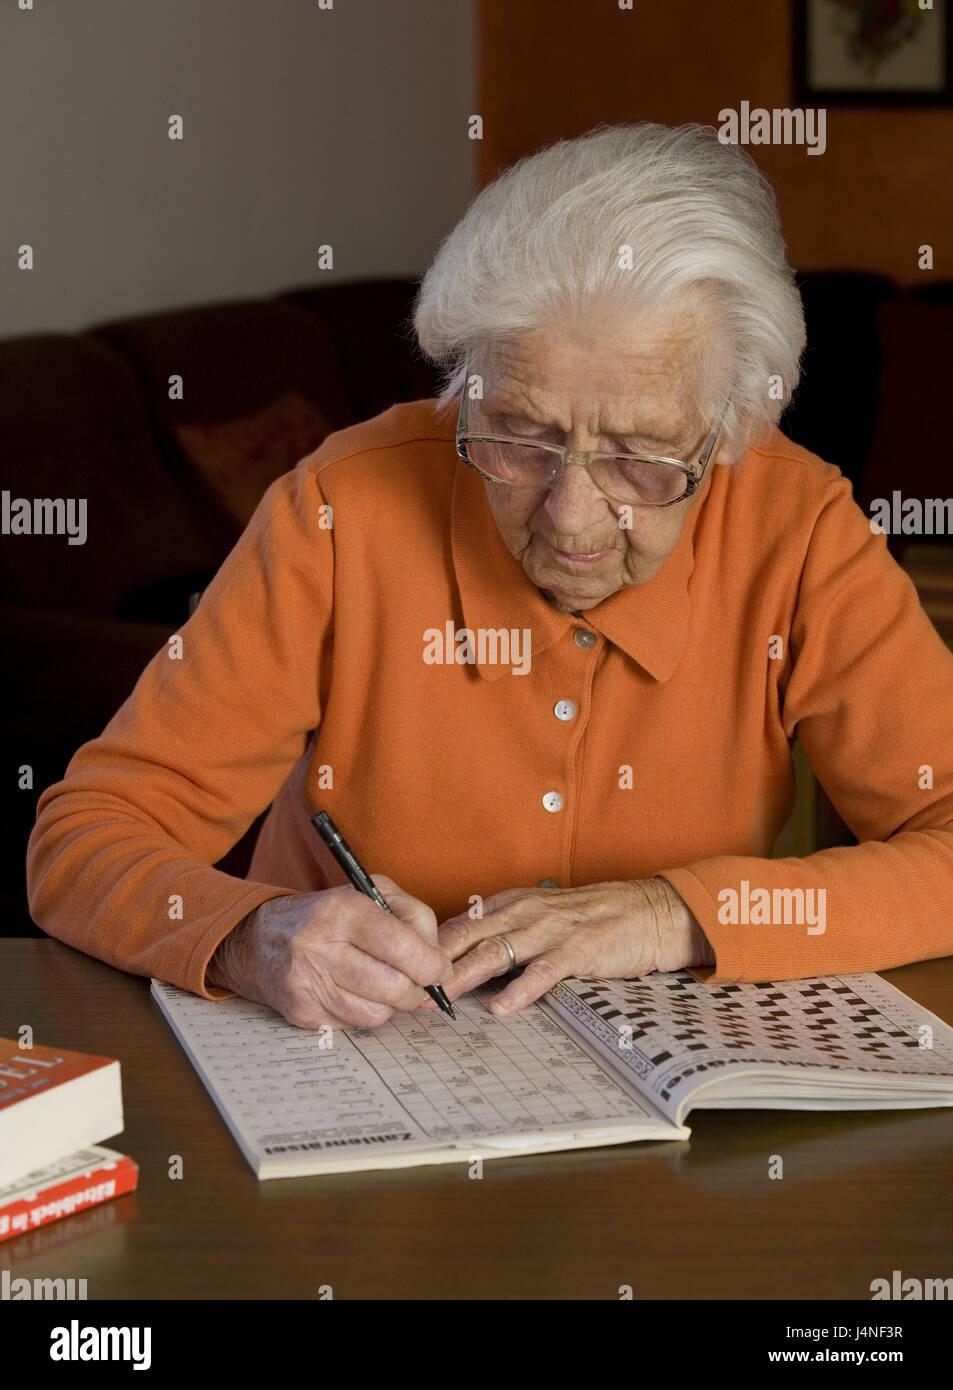 Senior, table, sit, write crossword puzzle, concentration, portrait, woman, person, glasses, view, puzzle book, - Stock Image